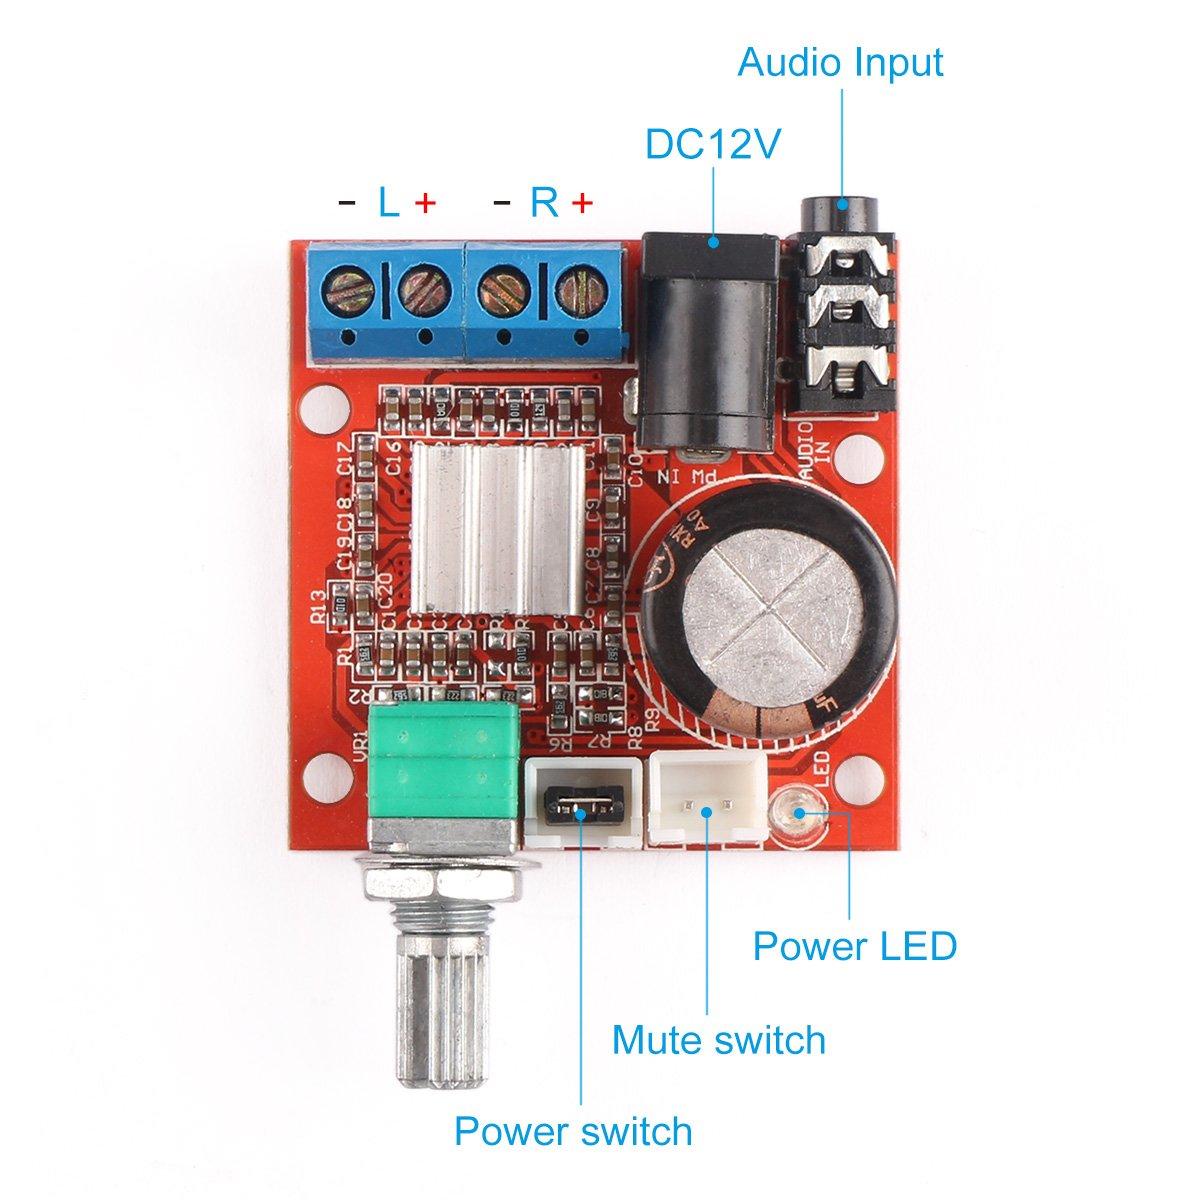 12 Volt Amplifier Board Drok Pam8610 Mini Stereo Amp 10w 20w Based Lm1876 Amplifiercircuit Circuit Digital Audio Amplify Class D 12v Dc Portable Low Power Ampli Module Dual Channel